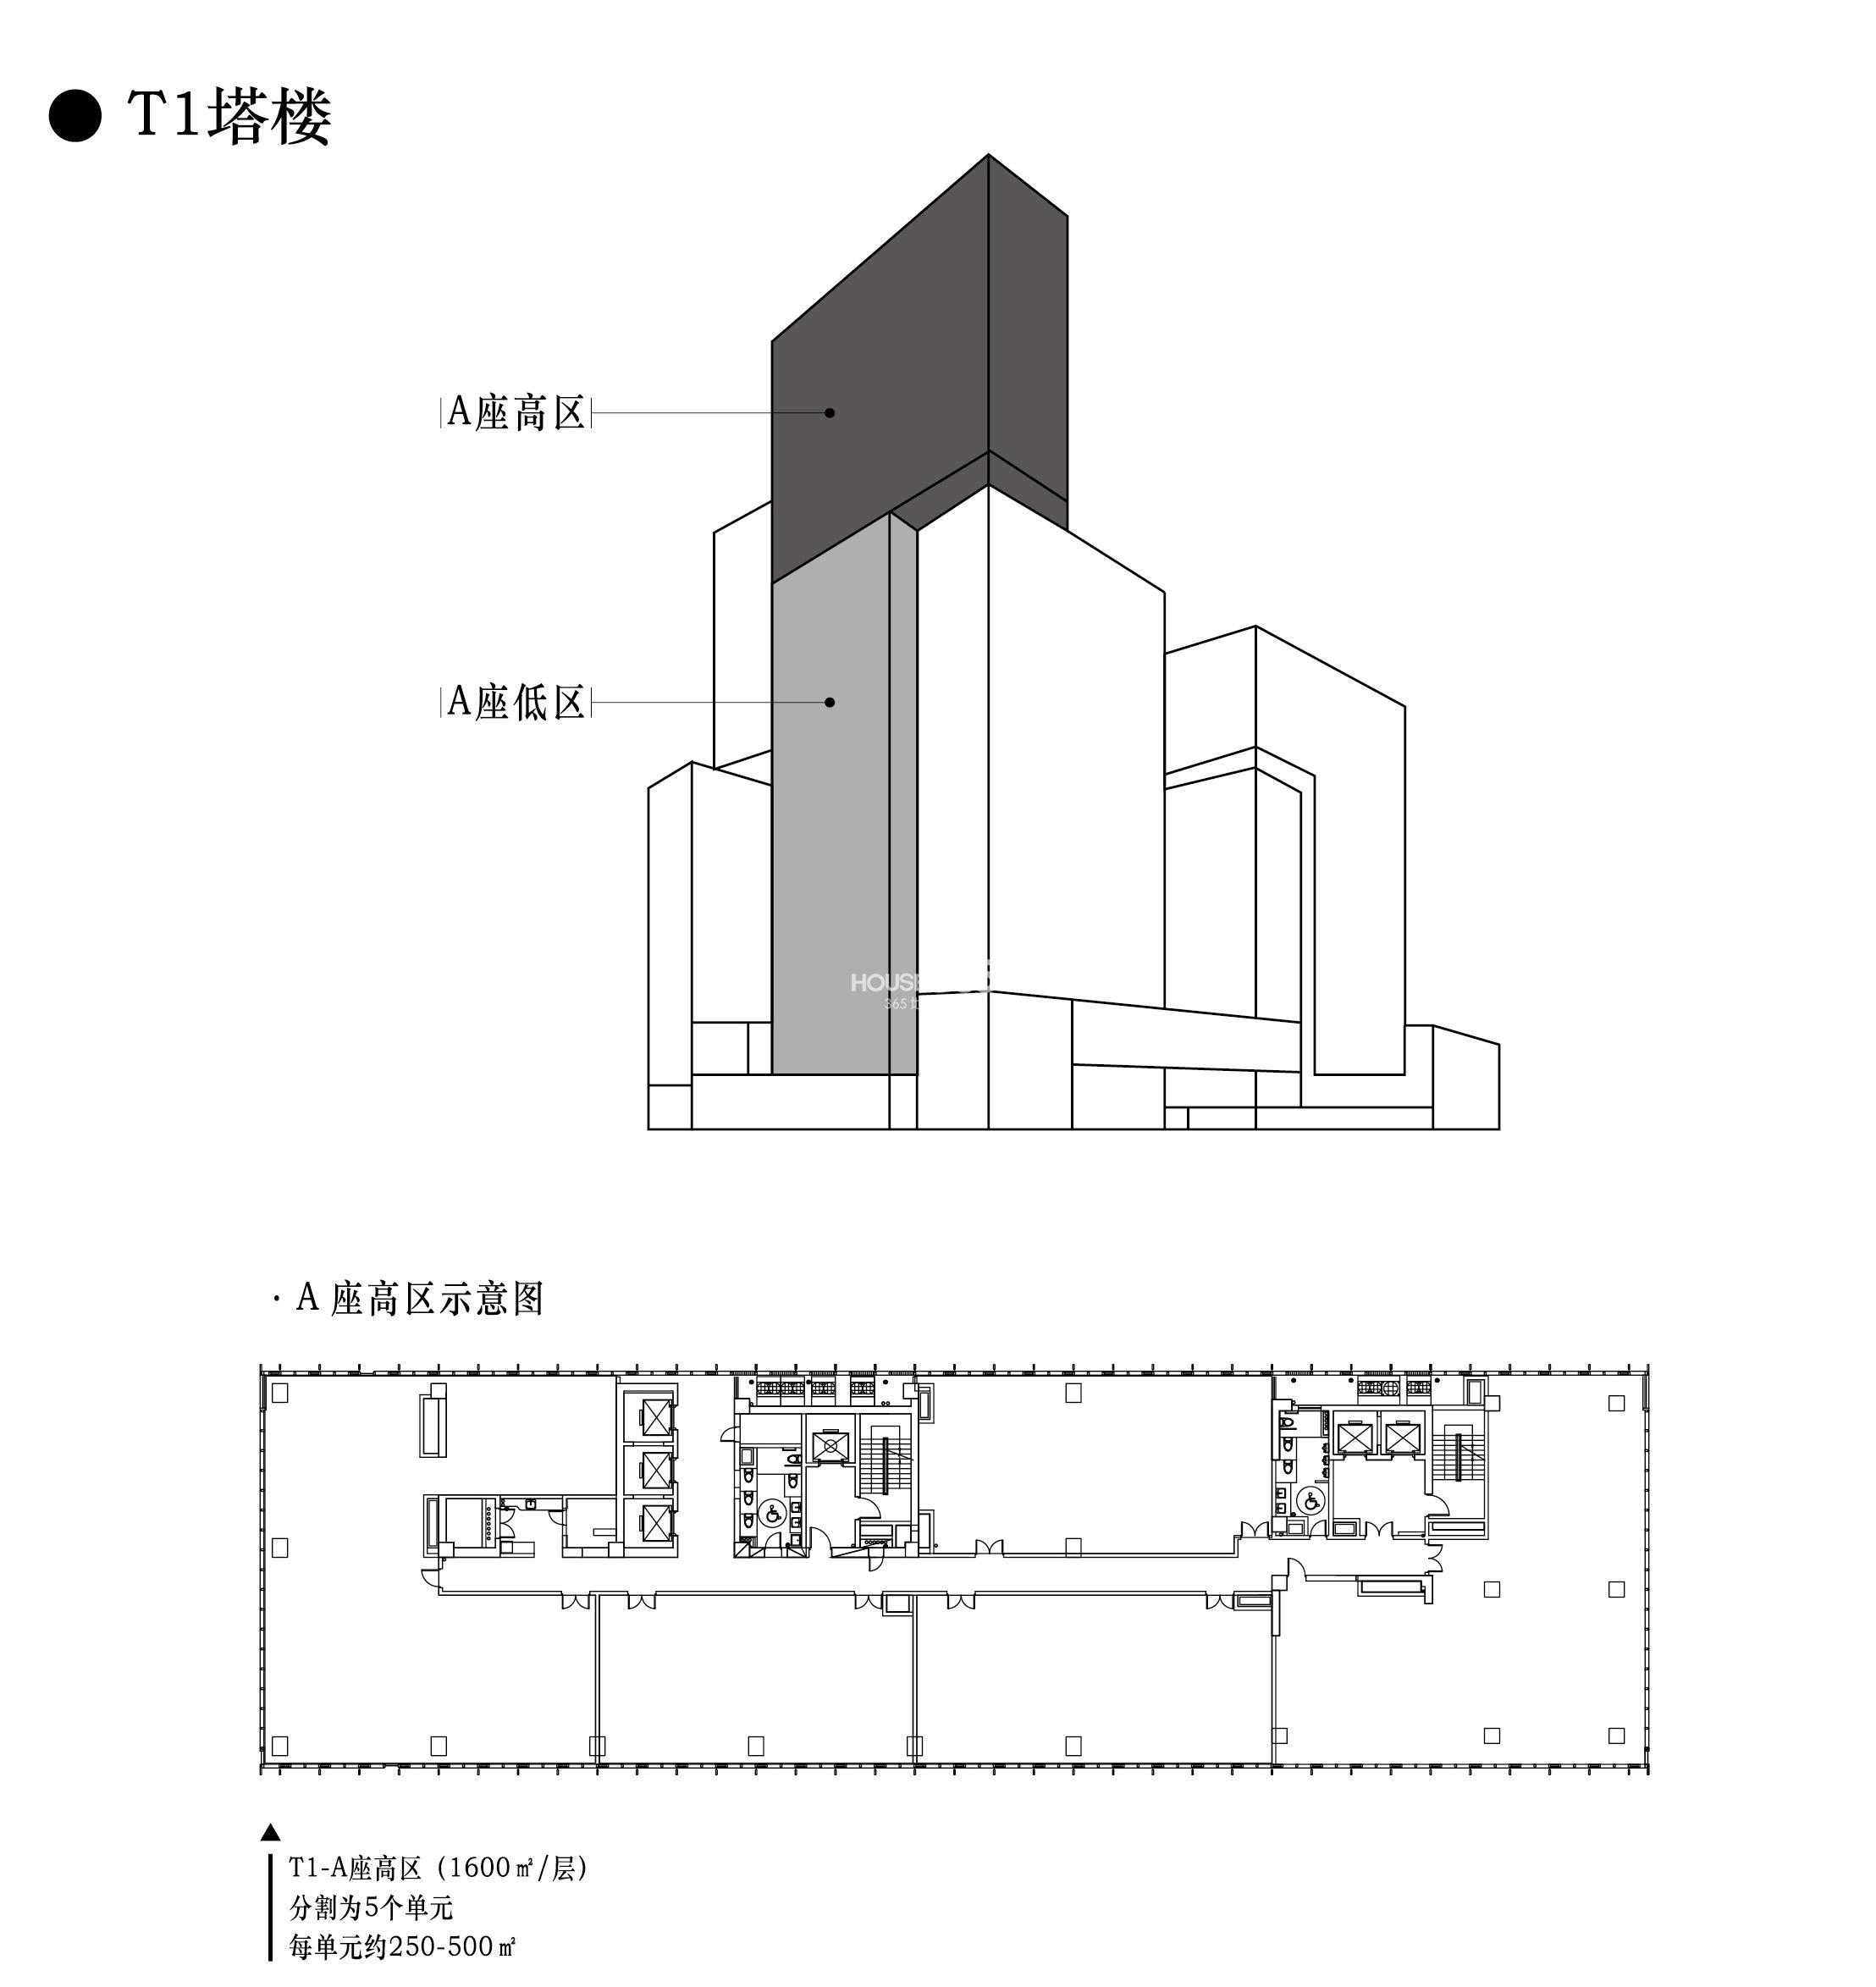 t1塔楼 a座高区户型图 每单元约250-500方